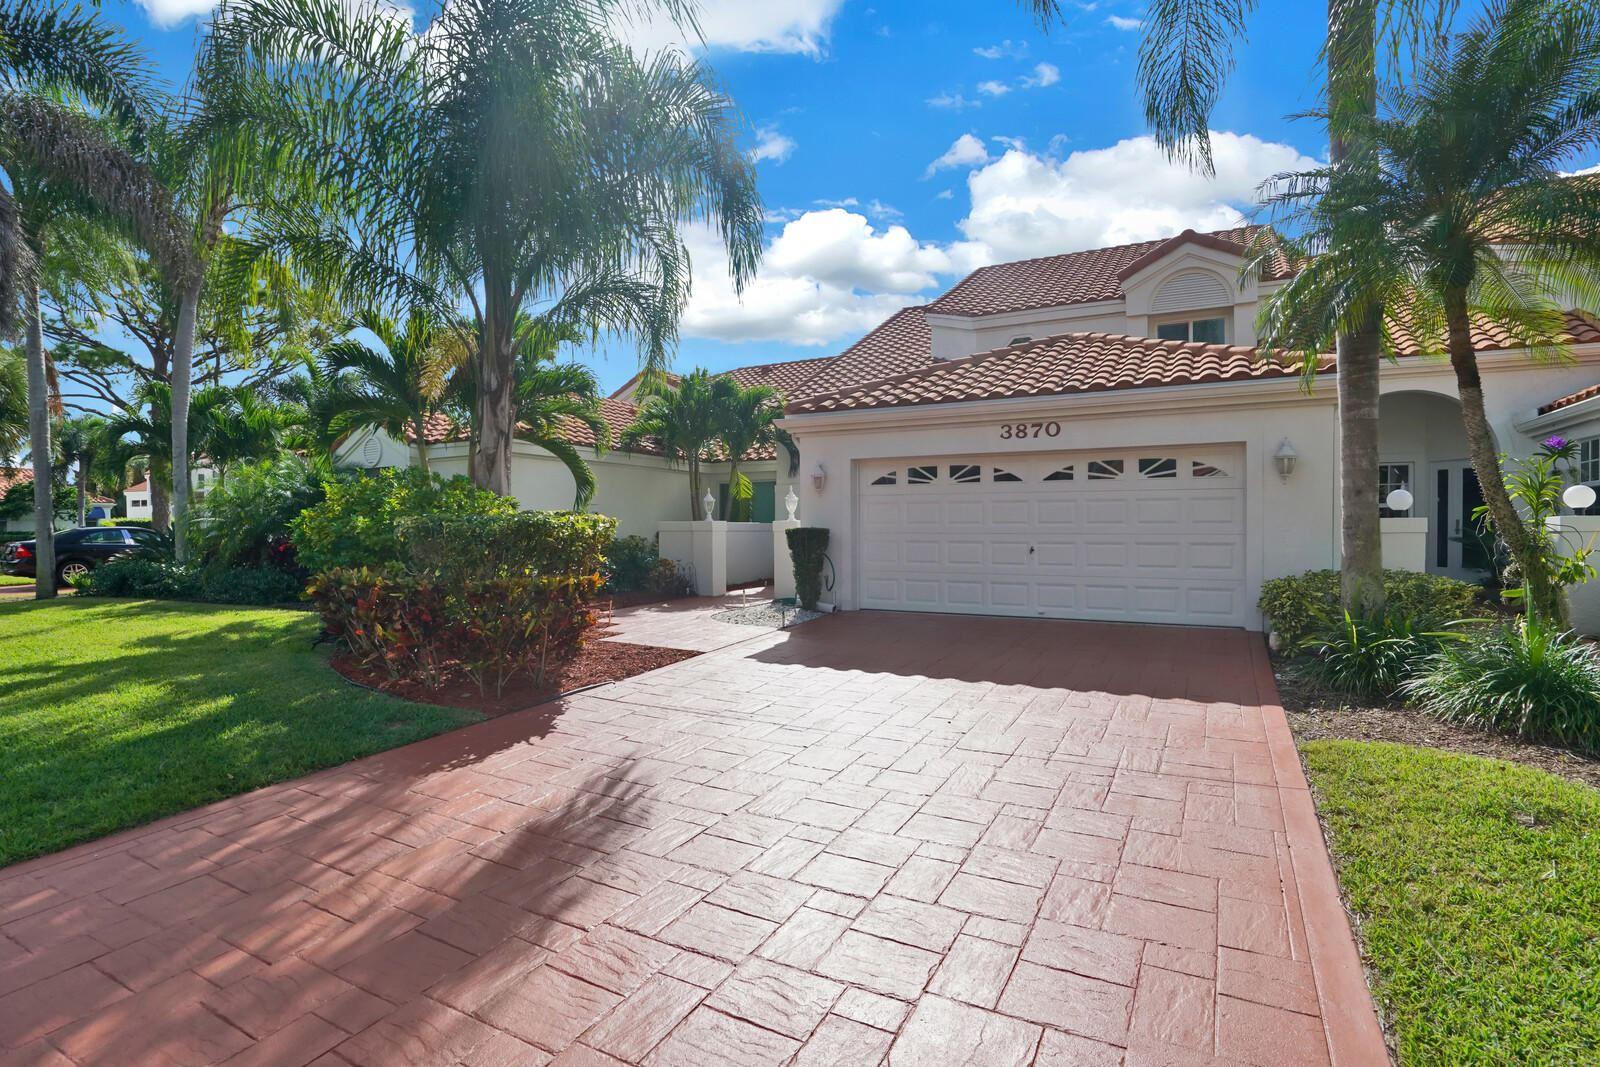 3870 Candlewood Boulevard, Boca Raton, FL 33487 - #: RX-10674293